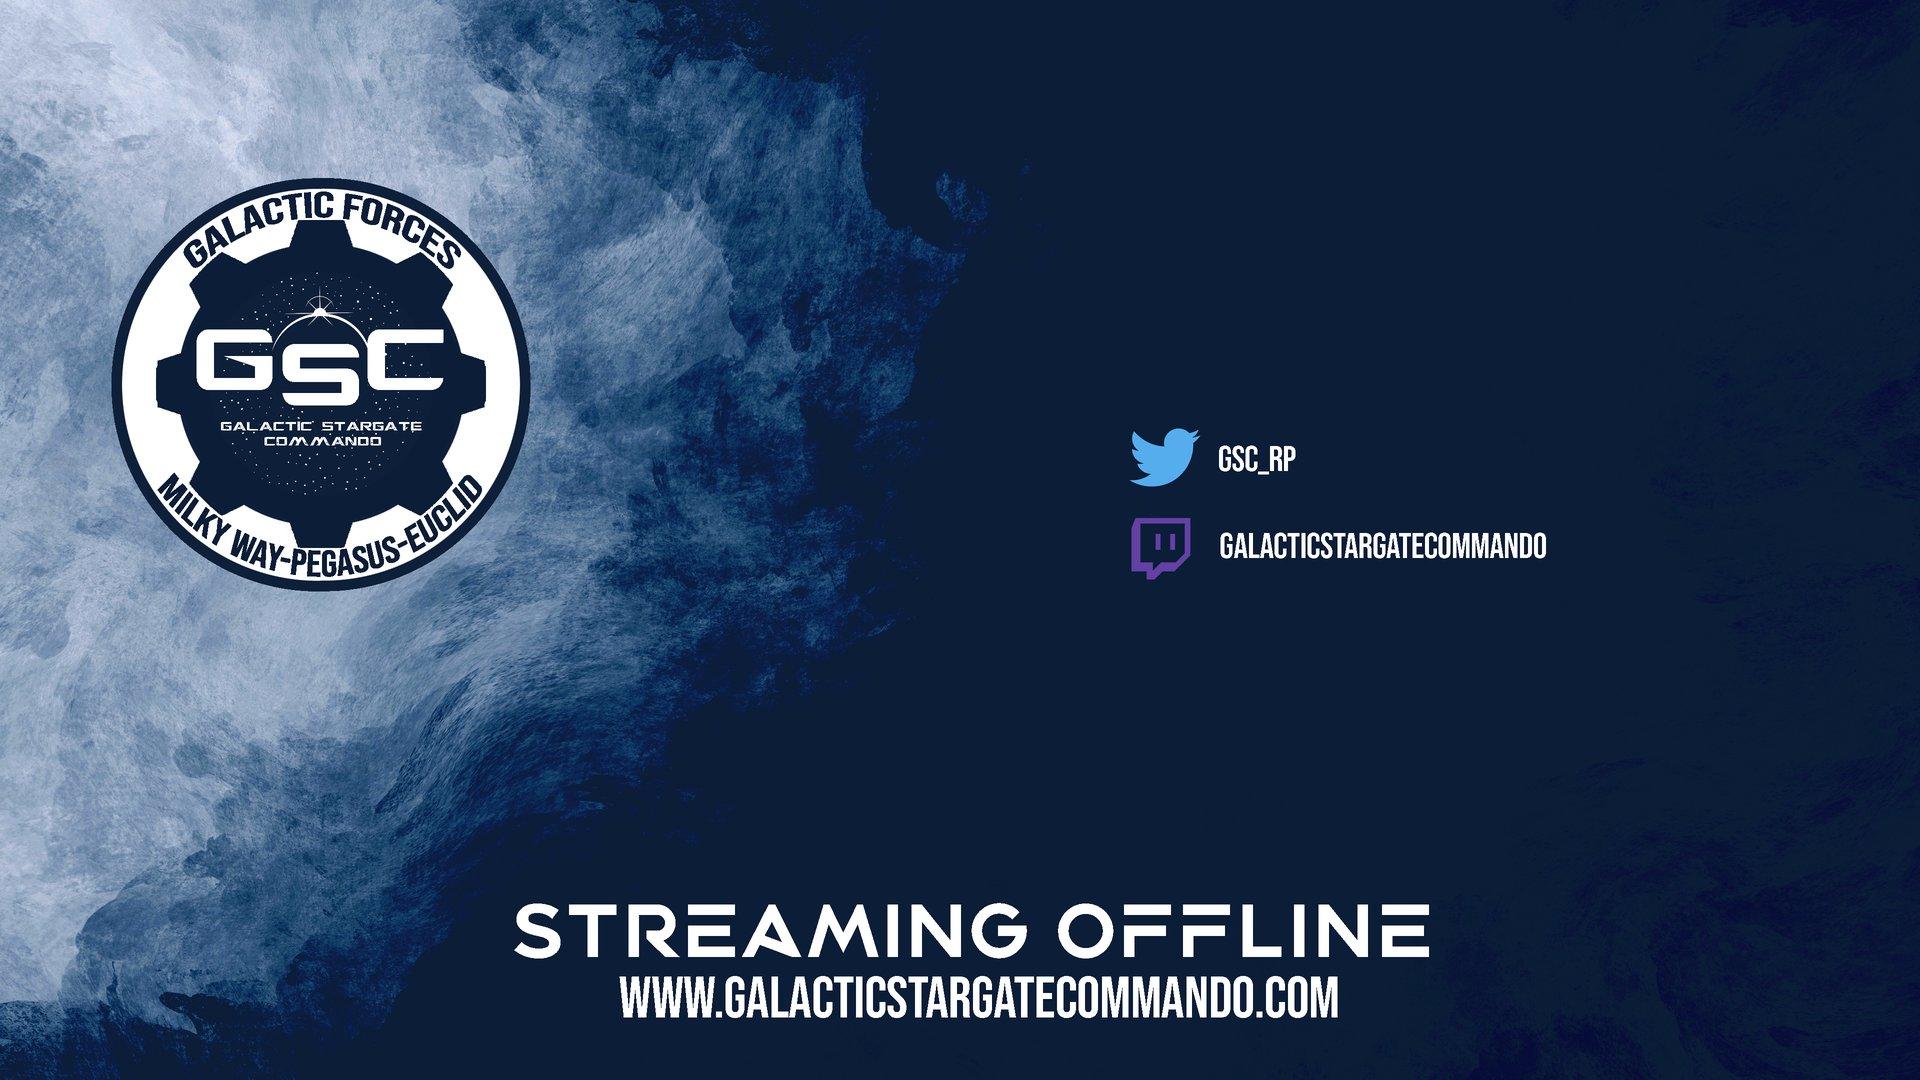 Twitch stream of GalacticStargateCommando